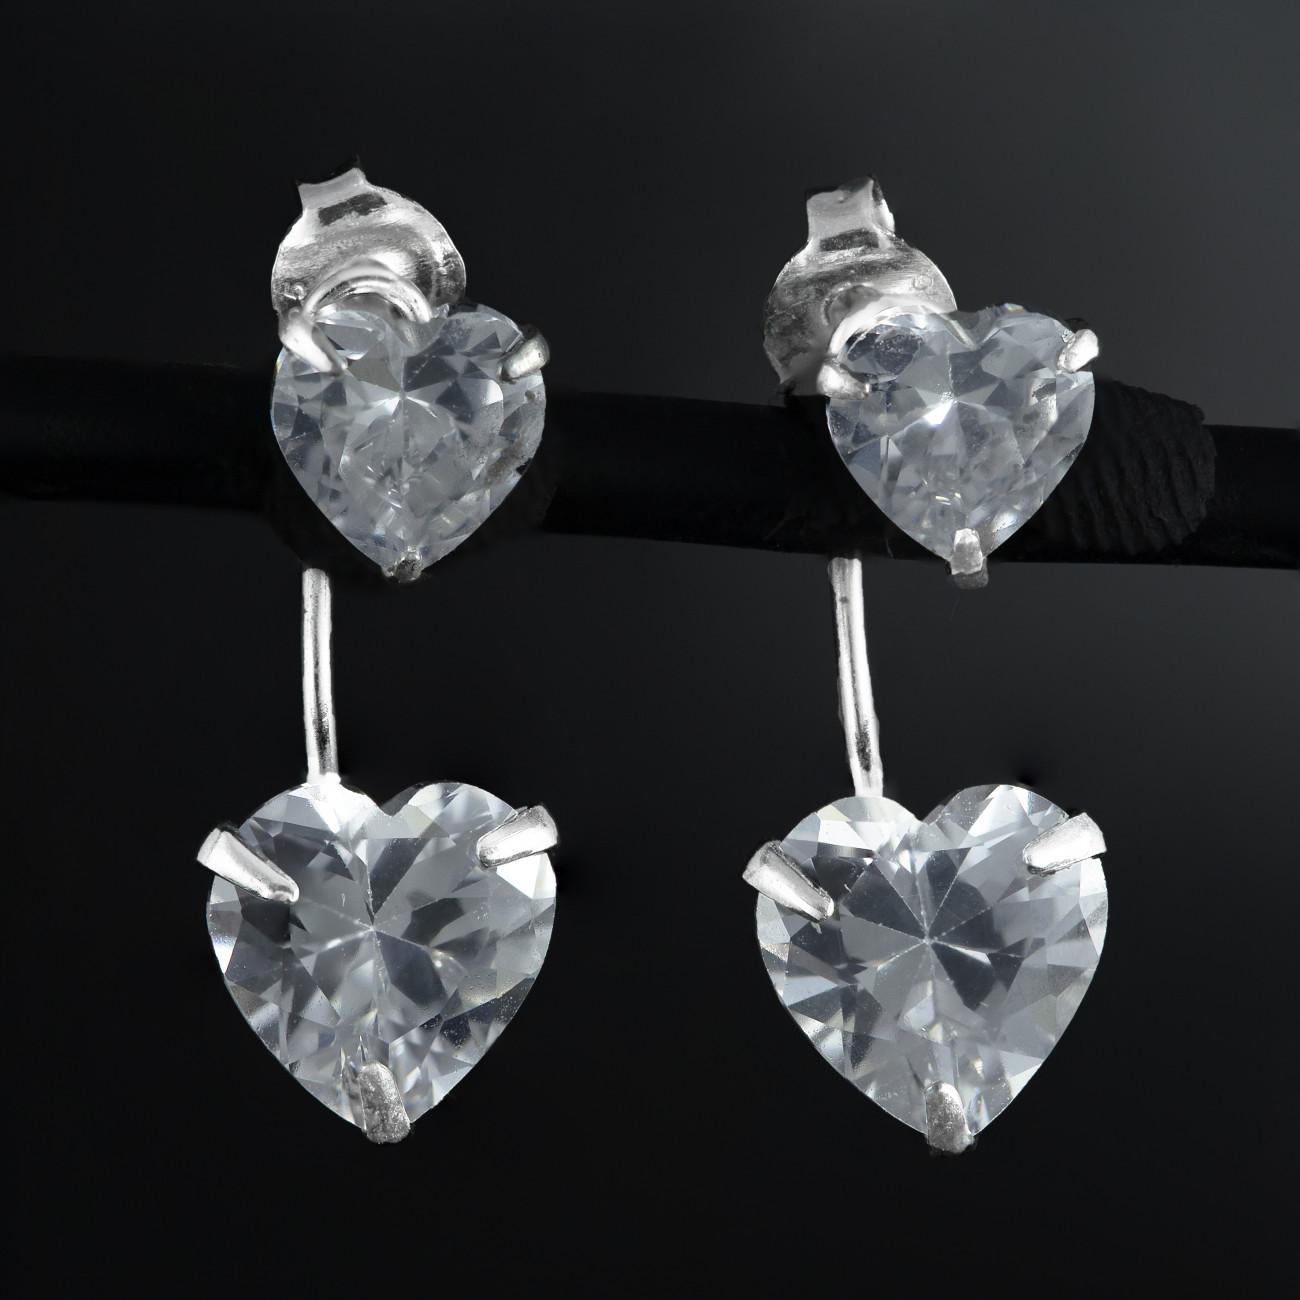 Stříbrné náušnice s dvojitými srdíčky Savour crystal